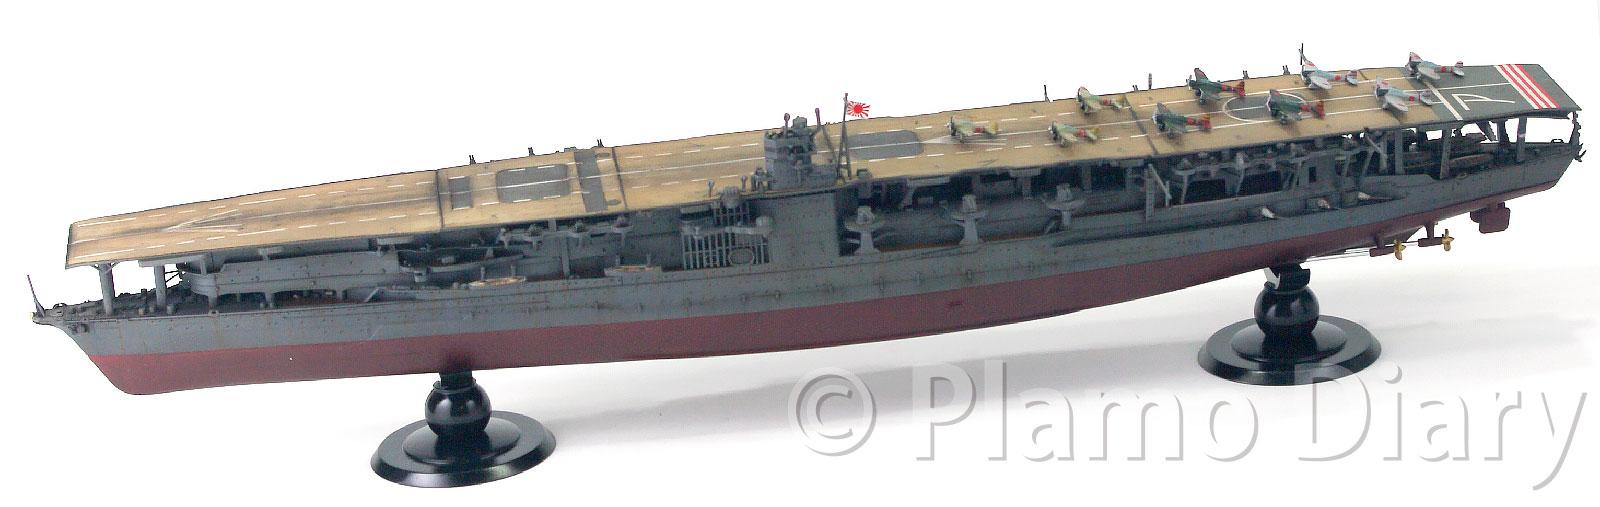 日本海軍・航空母艦赤城 1/700 フジミ